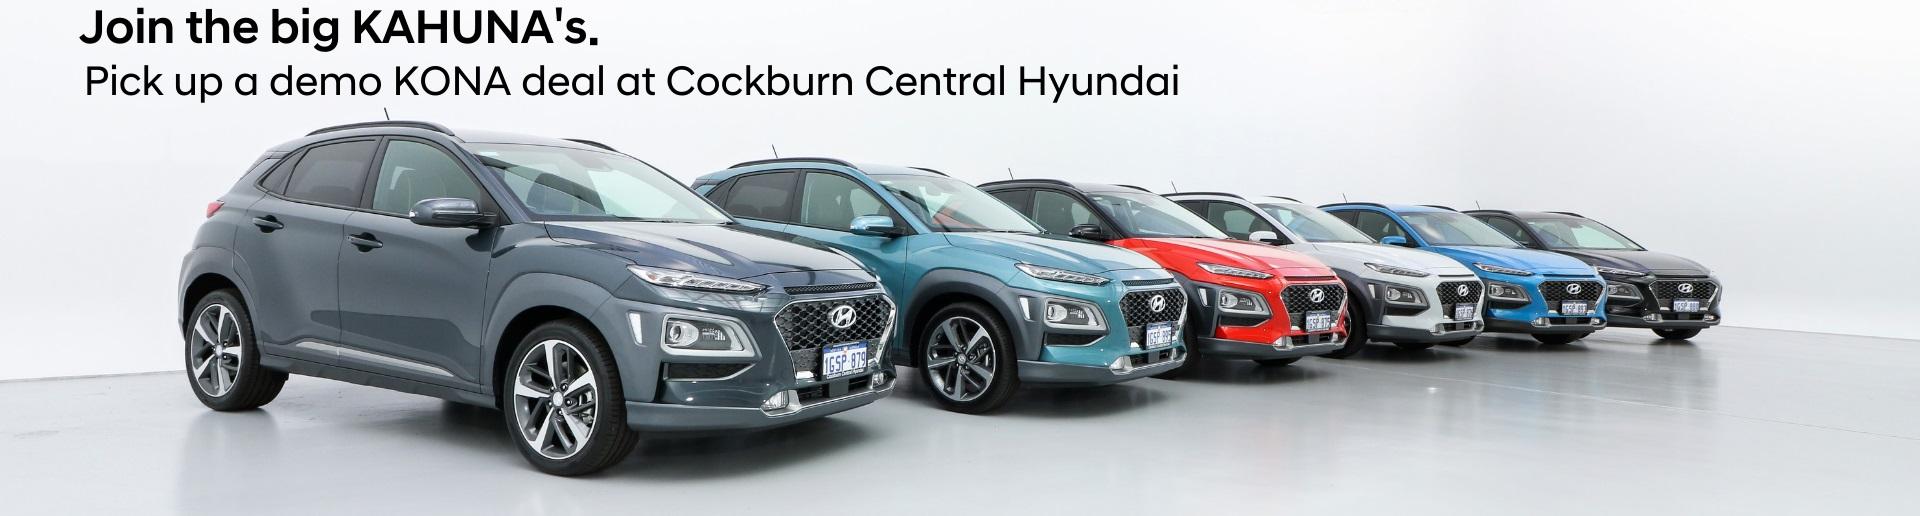 Hyundai KONA Demo Sale